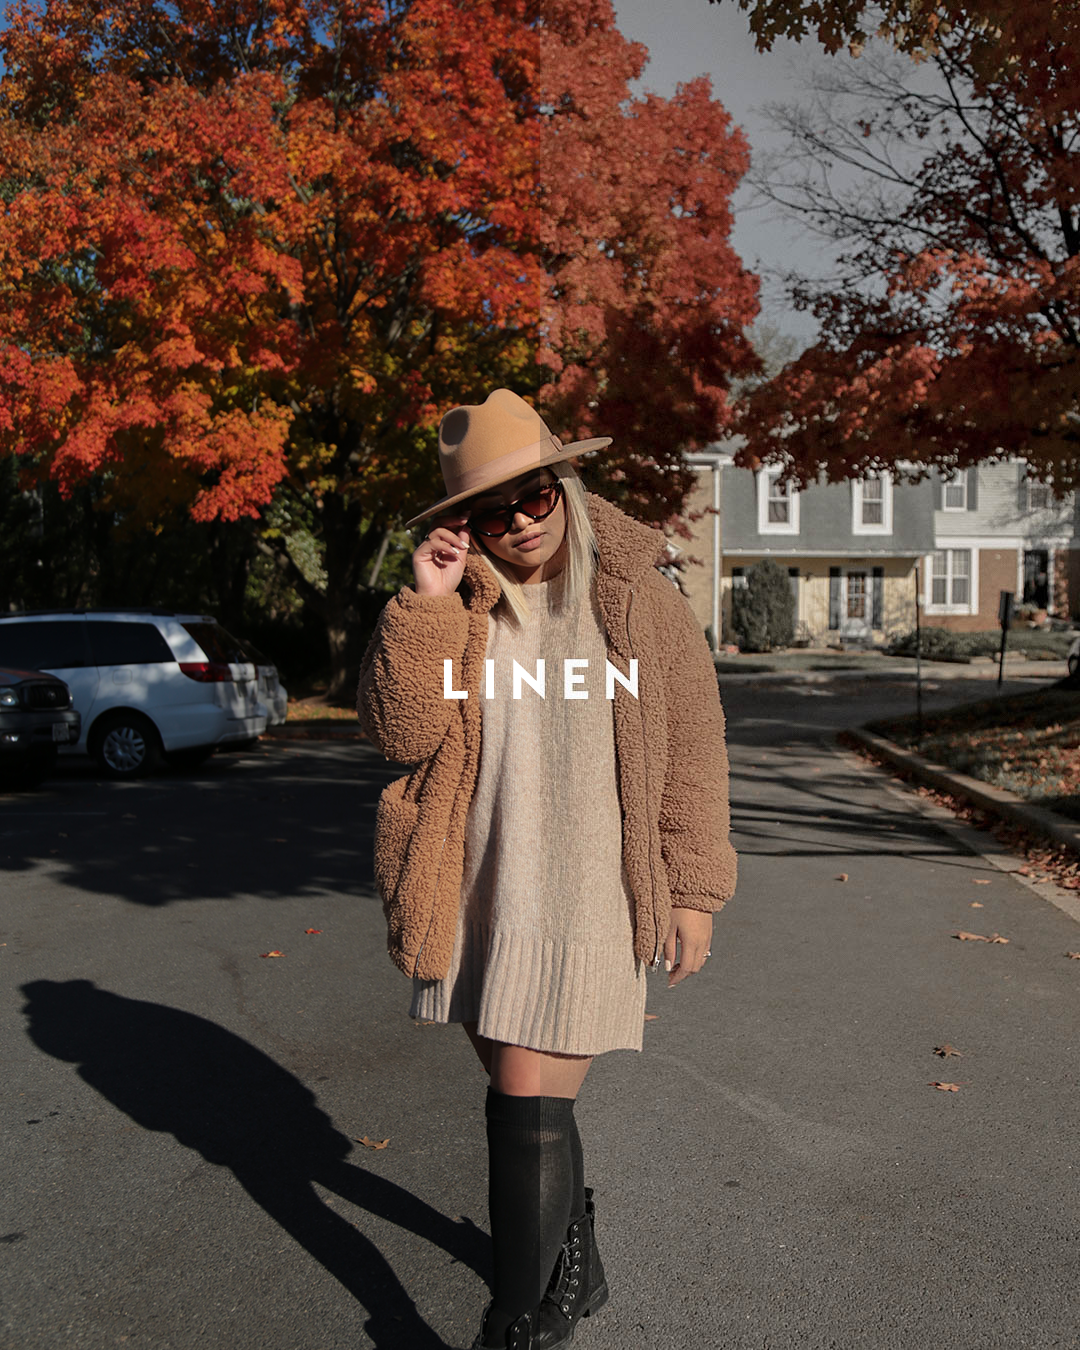 linen1.png